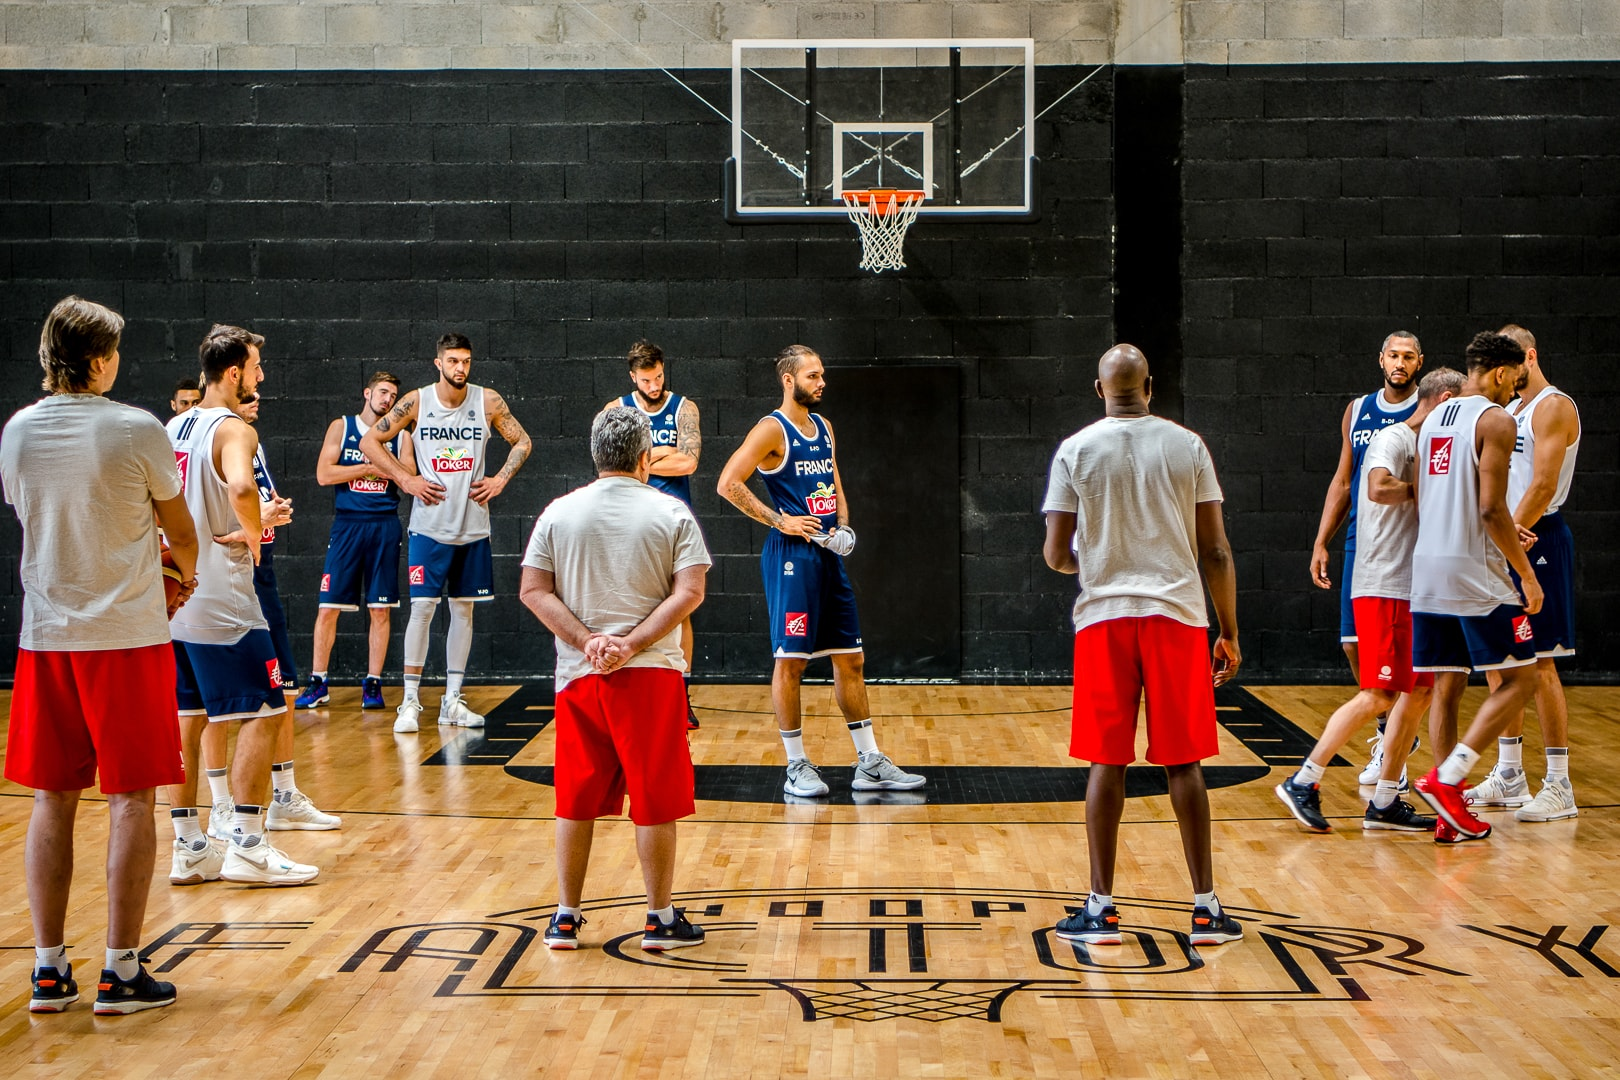 trezors-photography-photographe-professionnel-toulouse-31-sport-lifestyle-edf-basketball